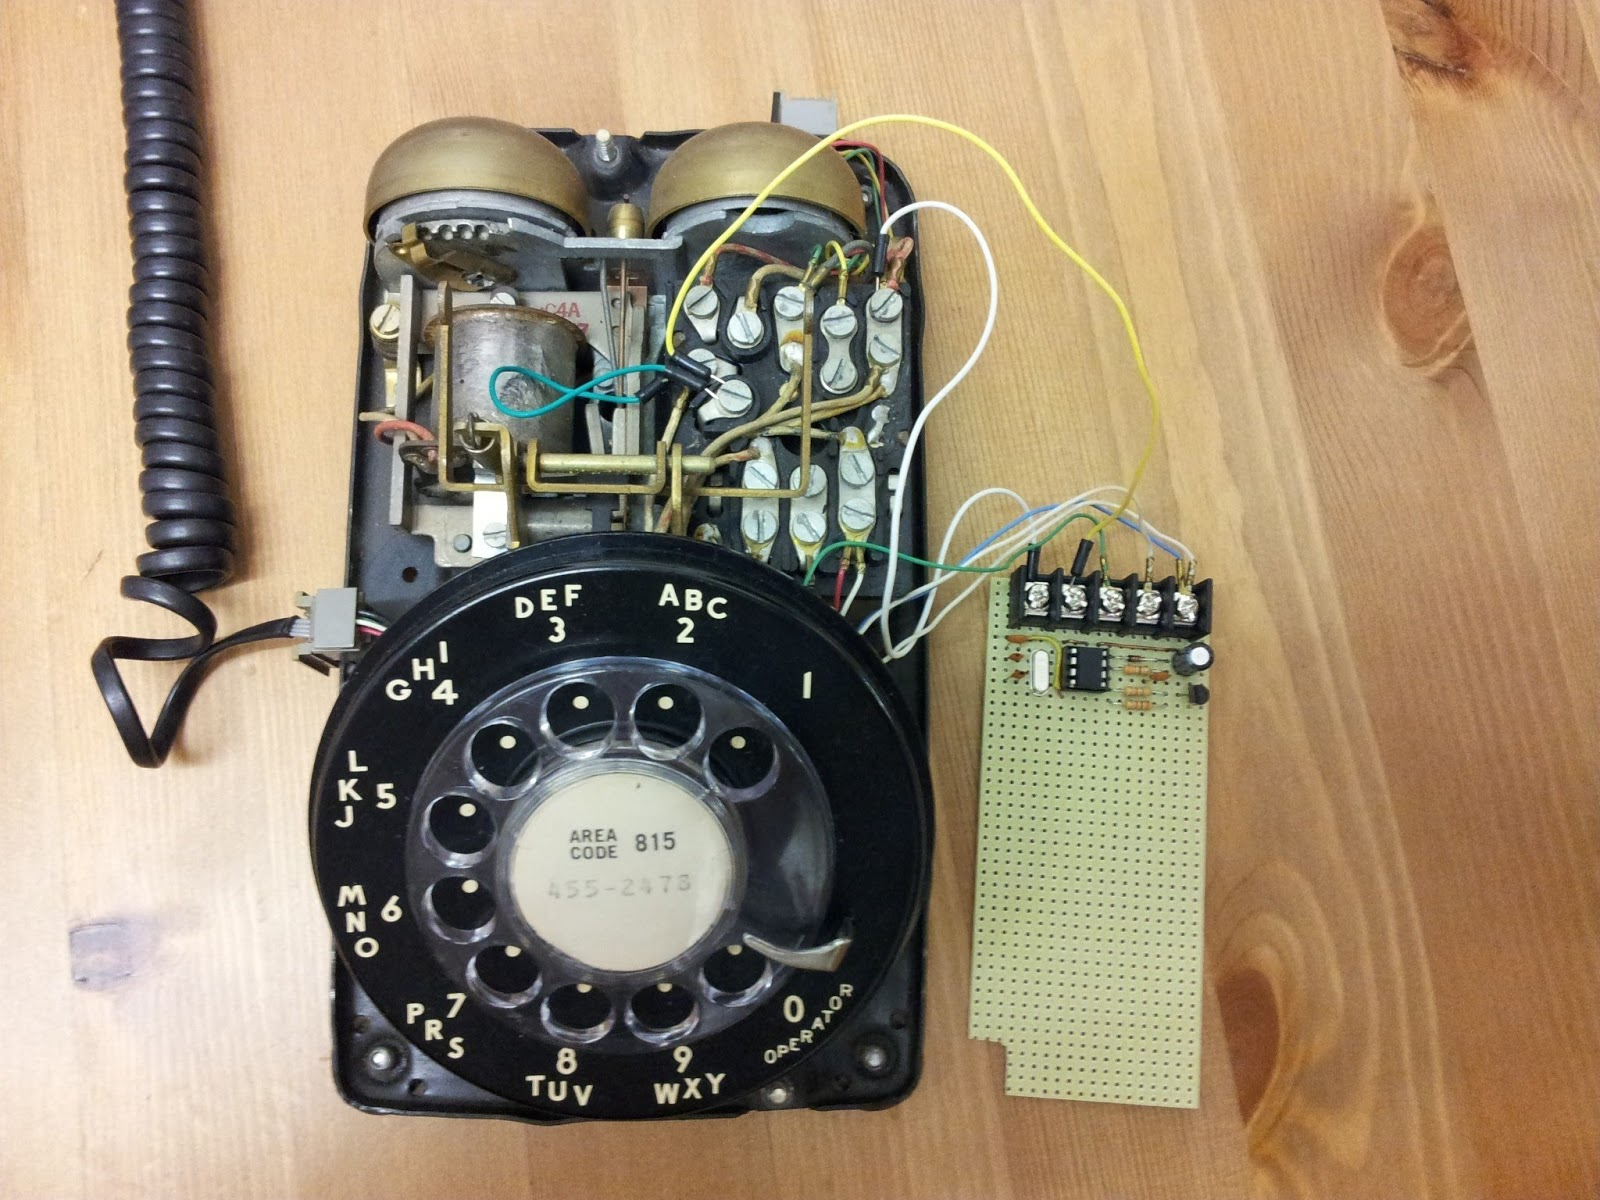 rotary dial telephone wiring diagram land cruiser for siemens phone 39